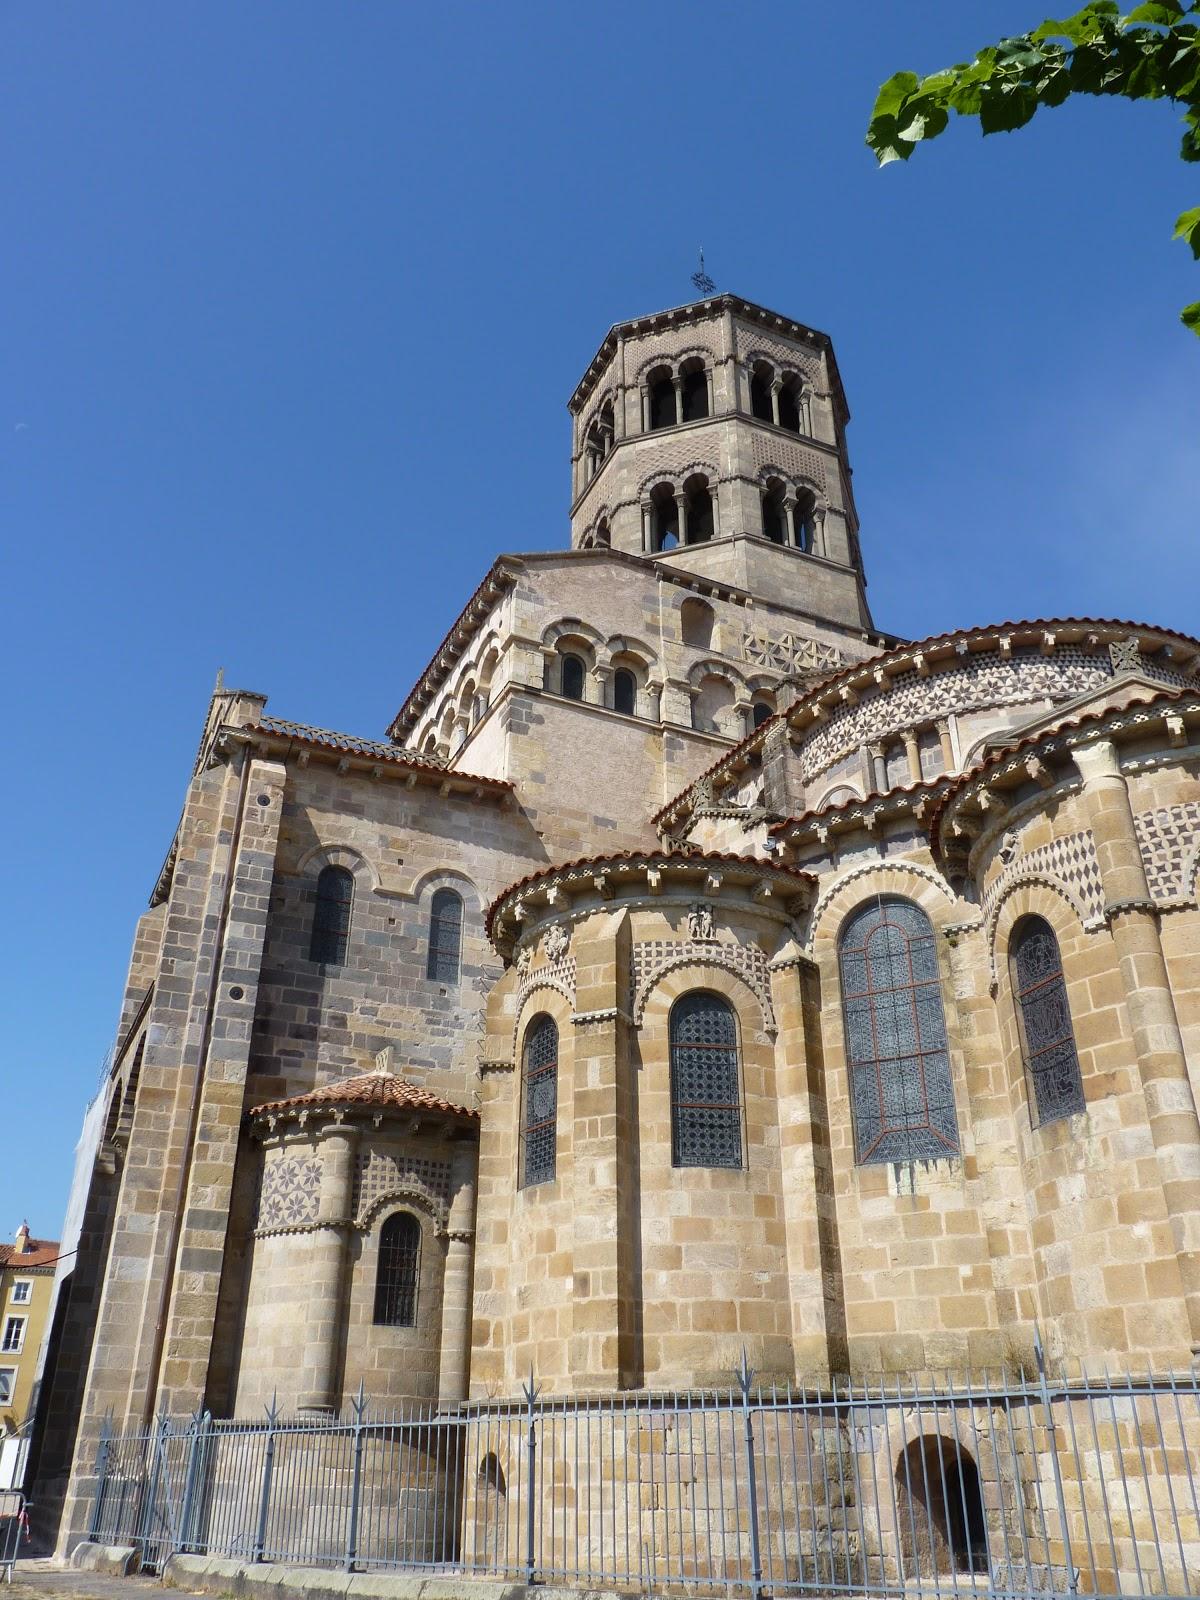 Issoire, Auvergne